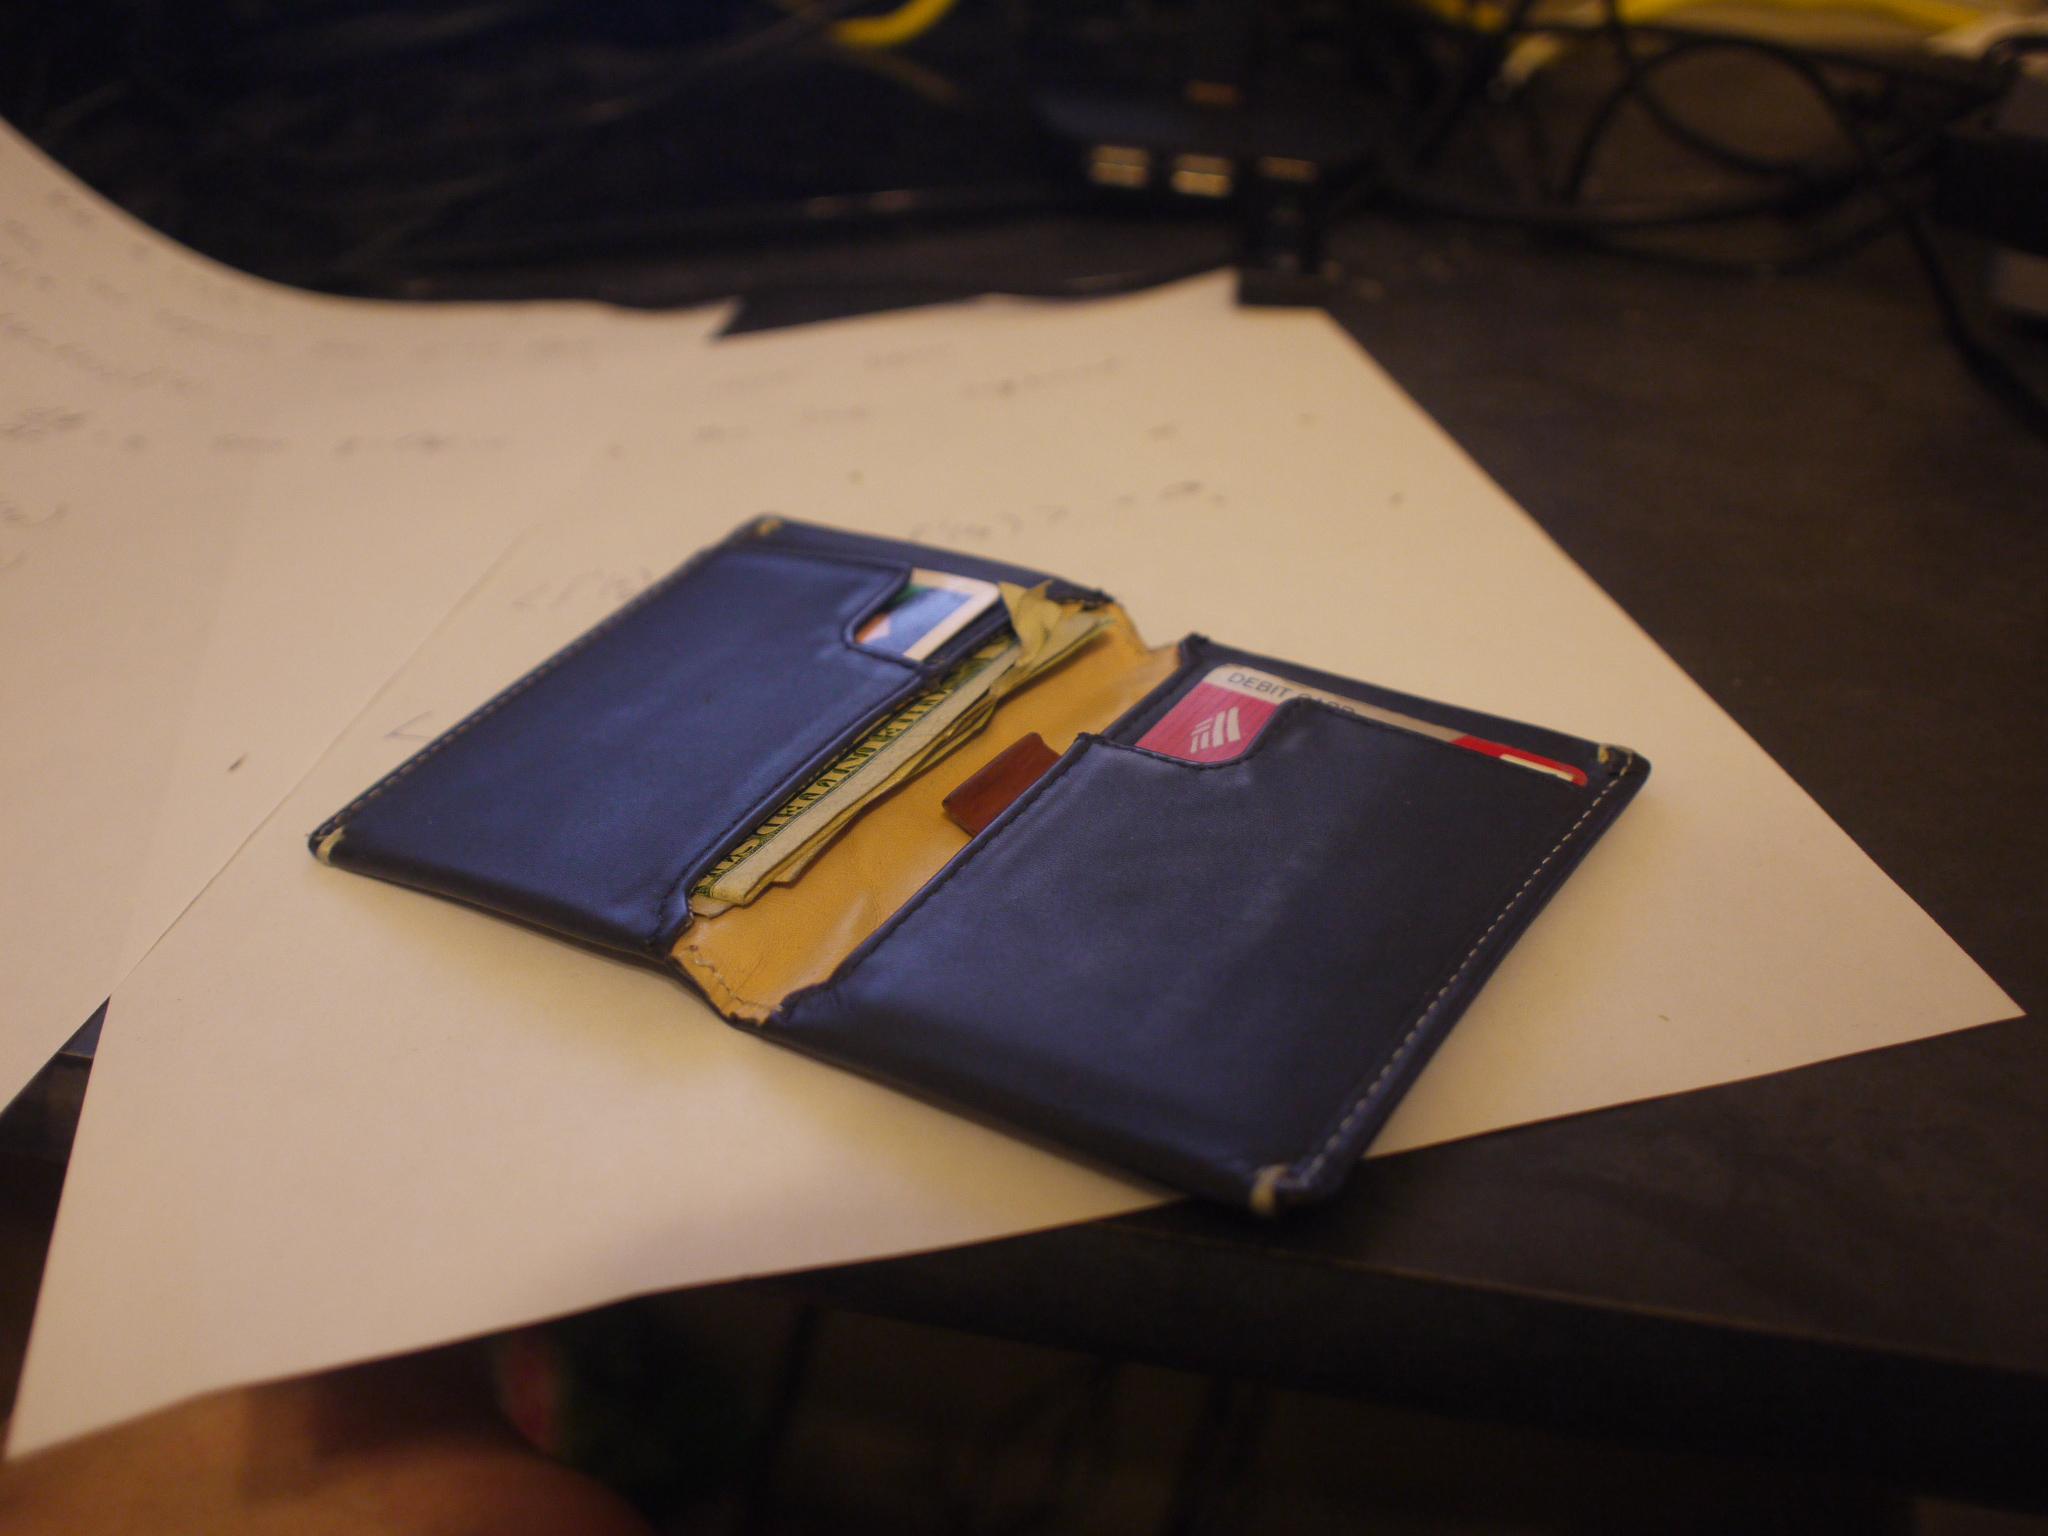 4b0350372e99 Wallet - Fi | Headphone Reviews and Discussion - Head-Fi.org